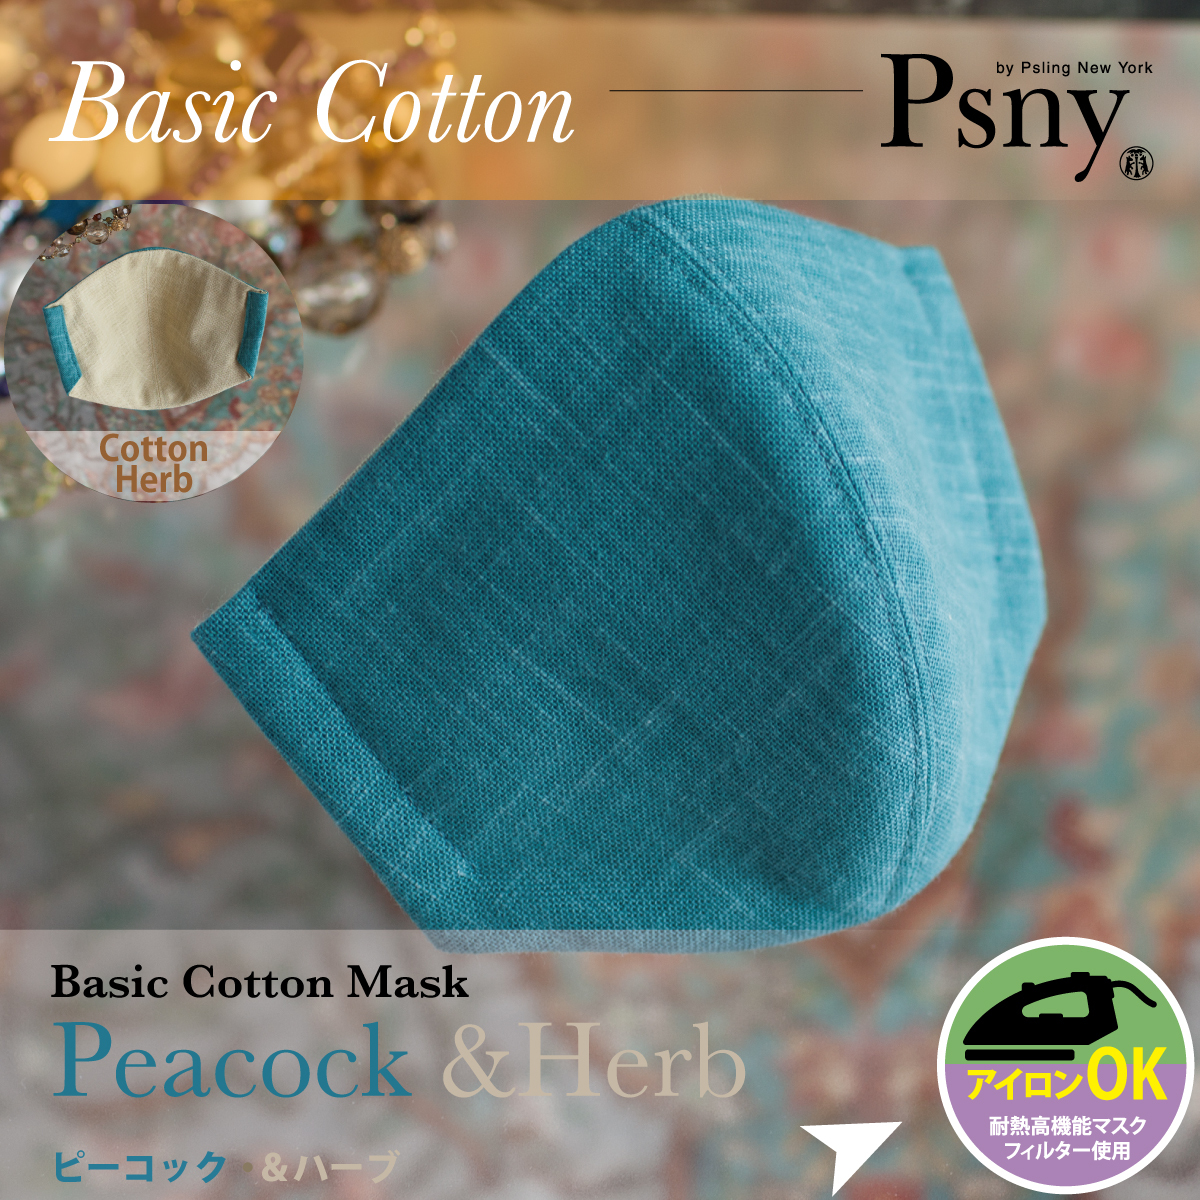 PSNY ベーシック コットン・ピーコック&ハーブ 花粉 黄砂 洗える不織布フィルター入り 立体 大人用 CC10 マスク 送料無料 CC5